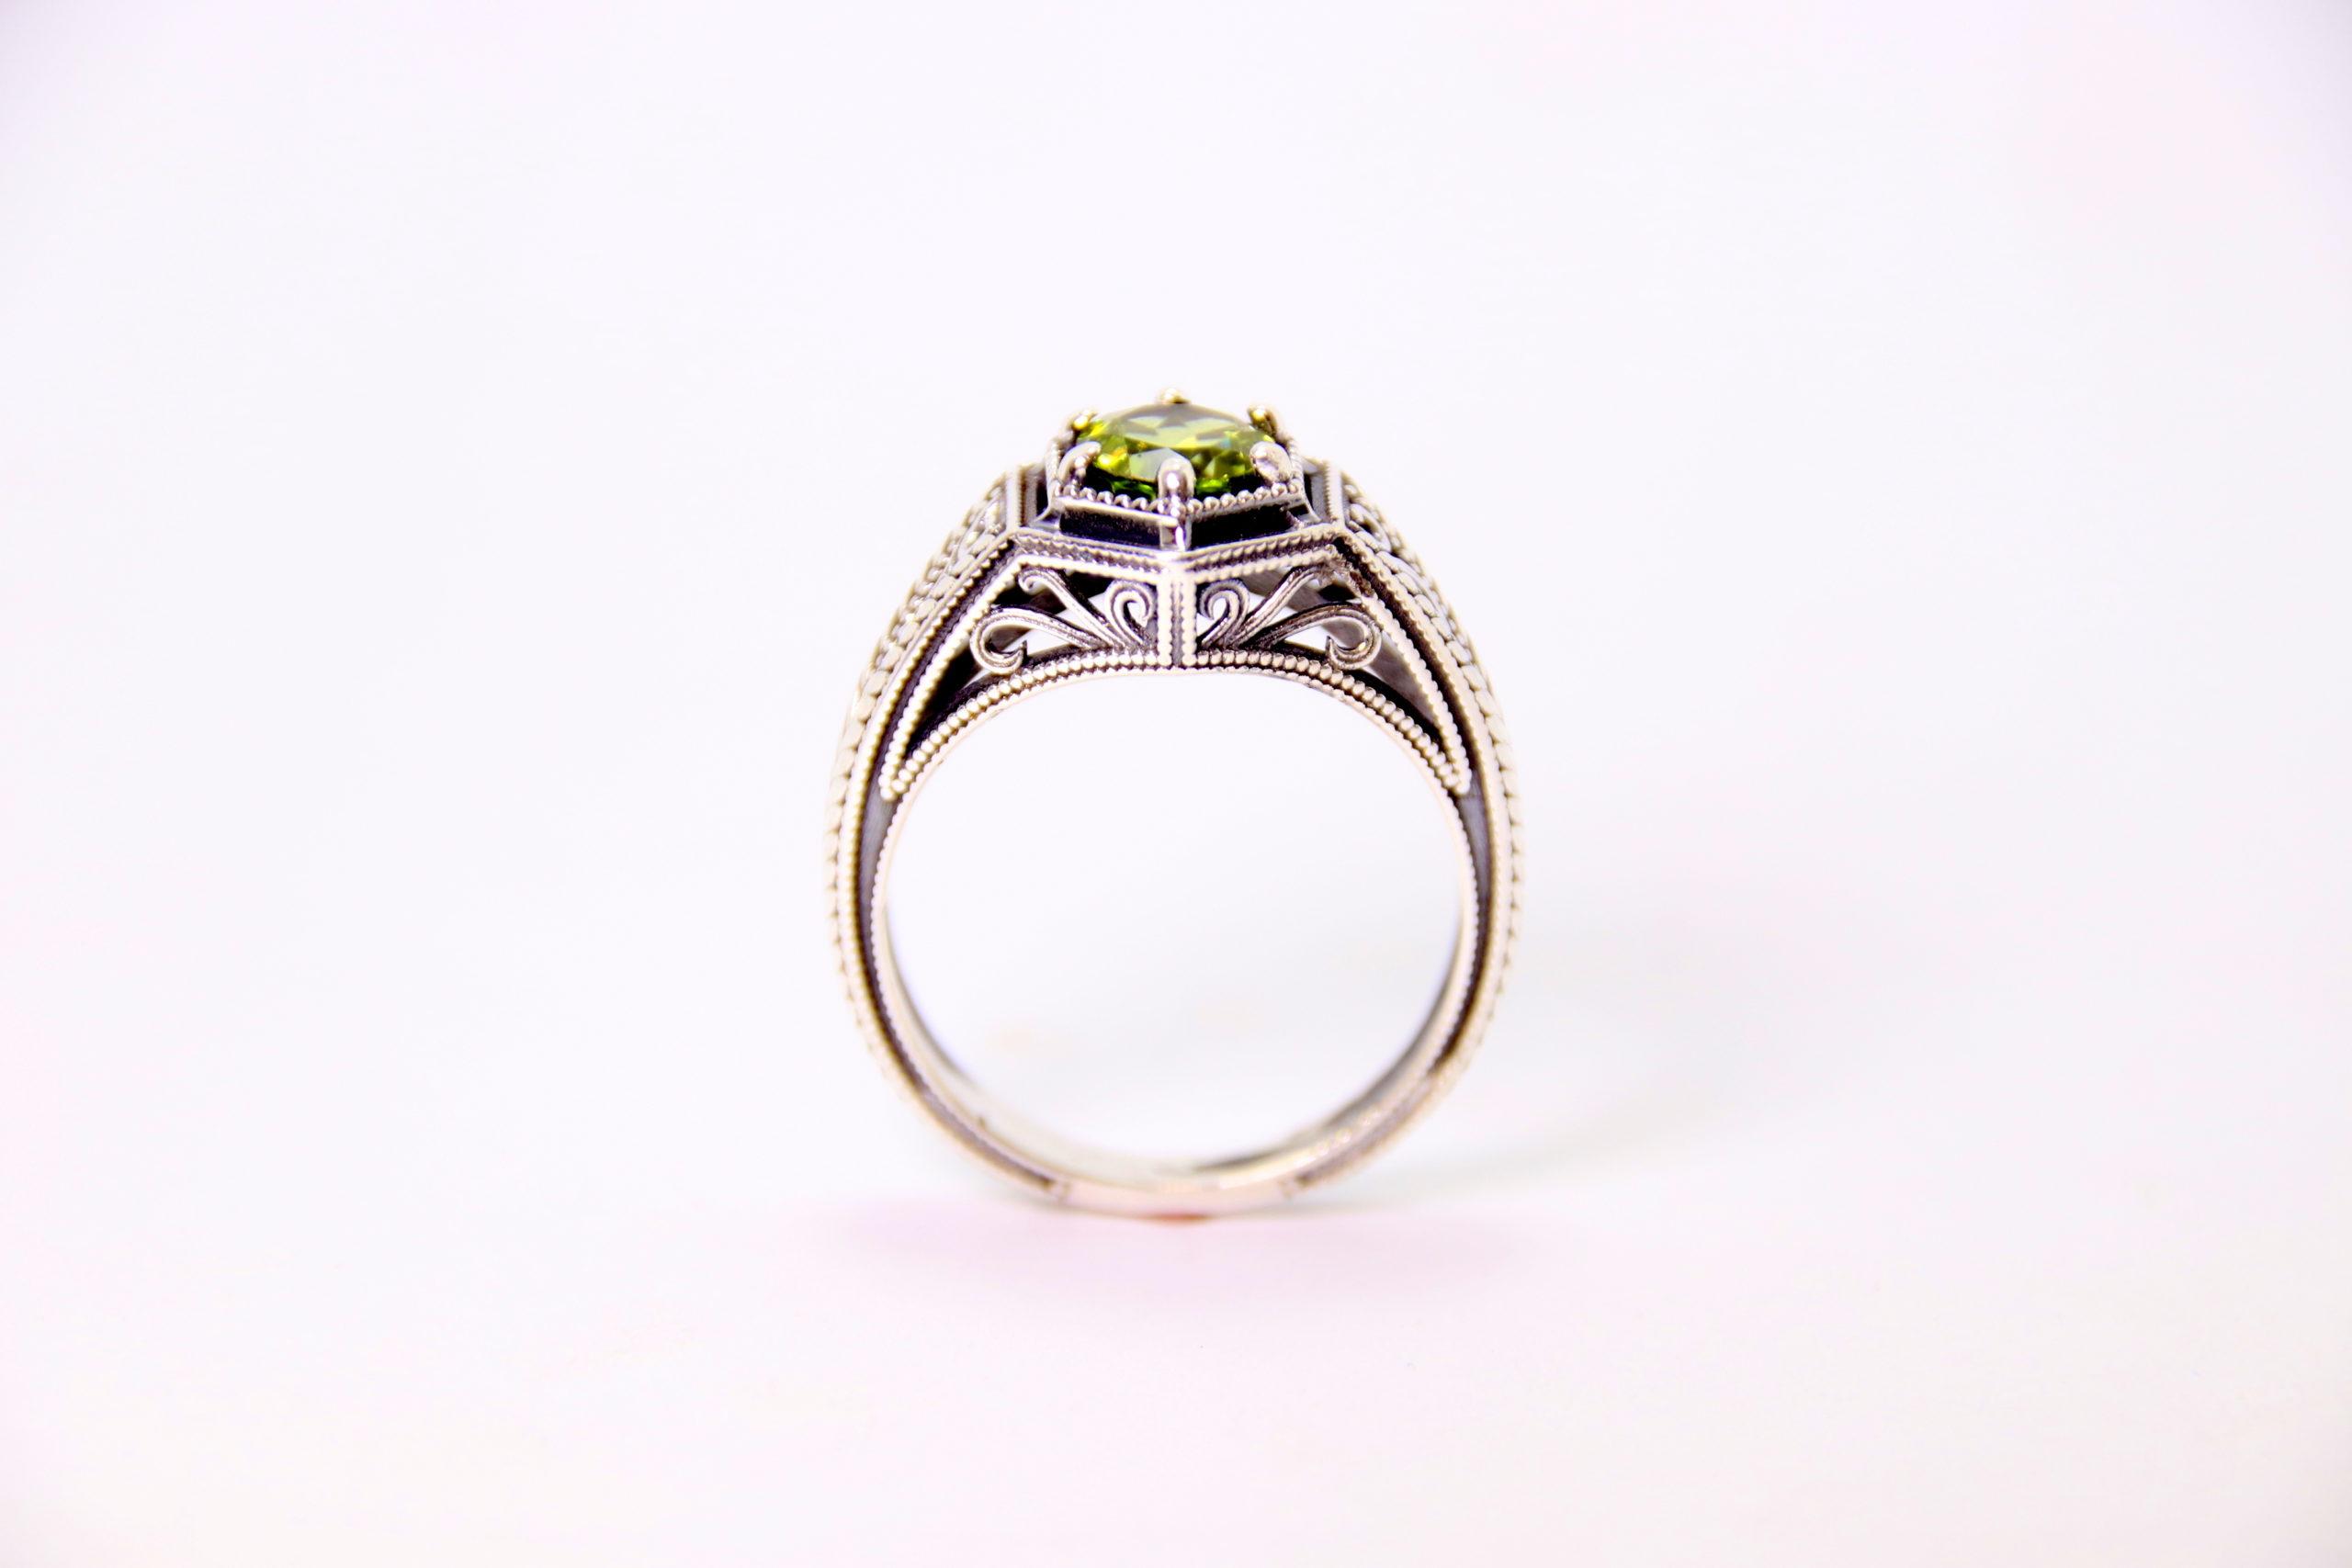 14k White Gold Peridot Ring 2 - Baltinester Jewelry